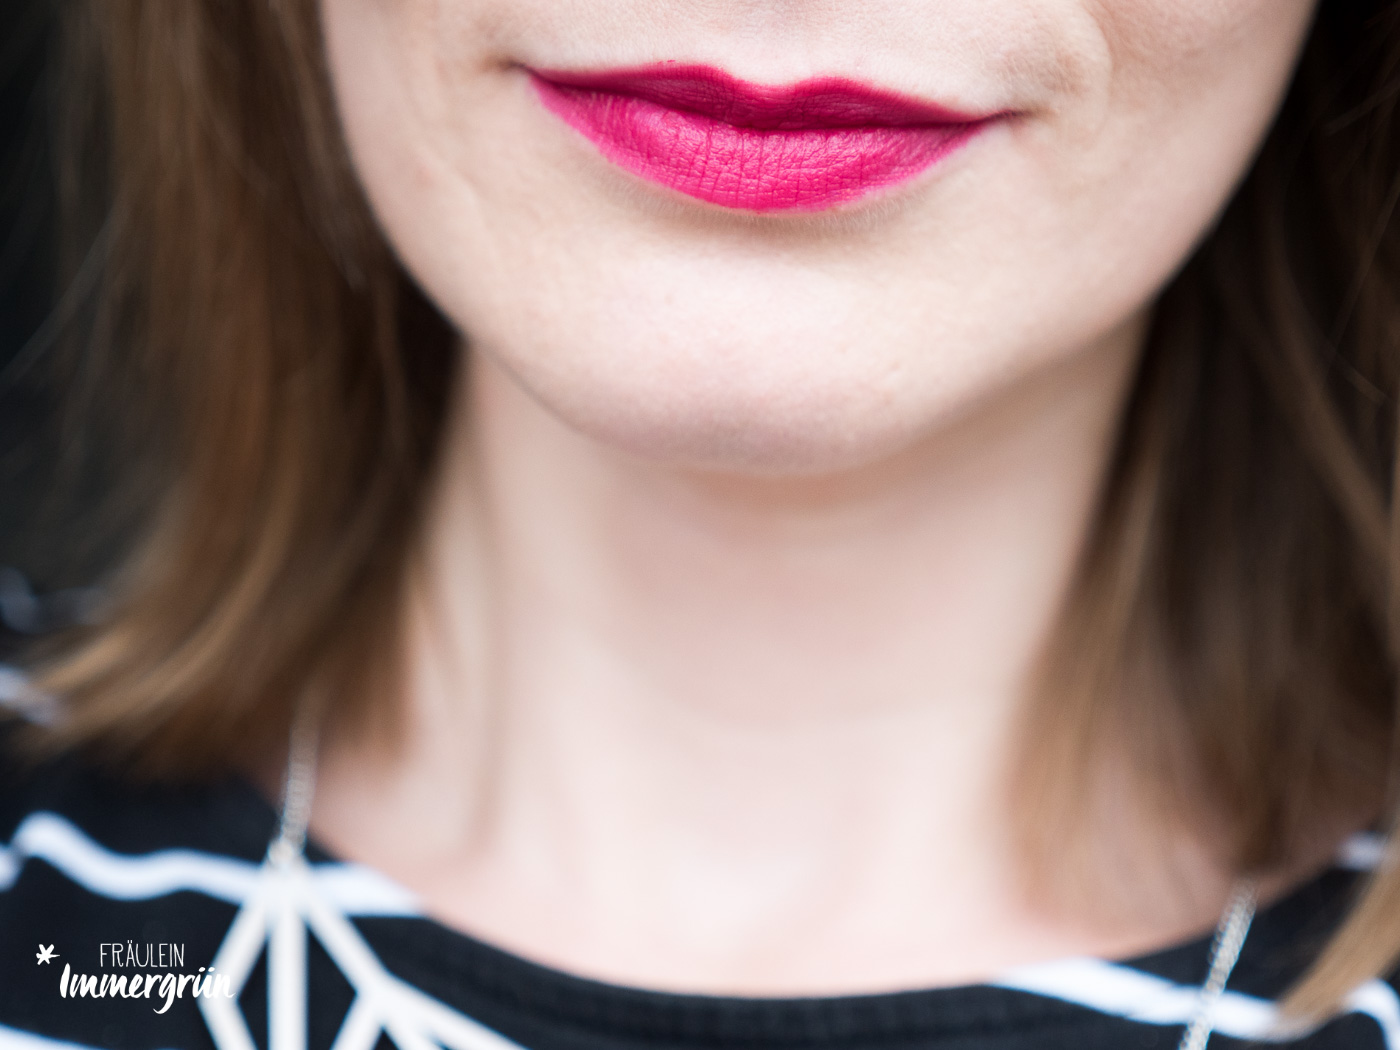 100 Percent Pure natuerlicher Lippenstift: Tragefoto von Cocoa Butter Semi-Matte Lipstick Currant. Vegane Naturkosmetik.